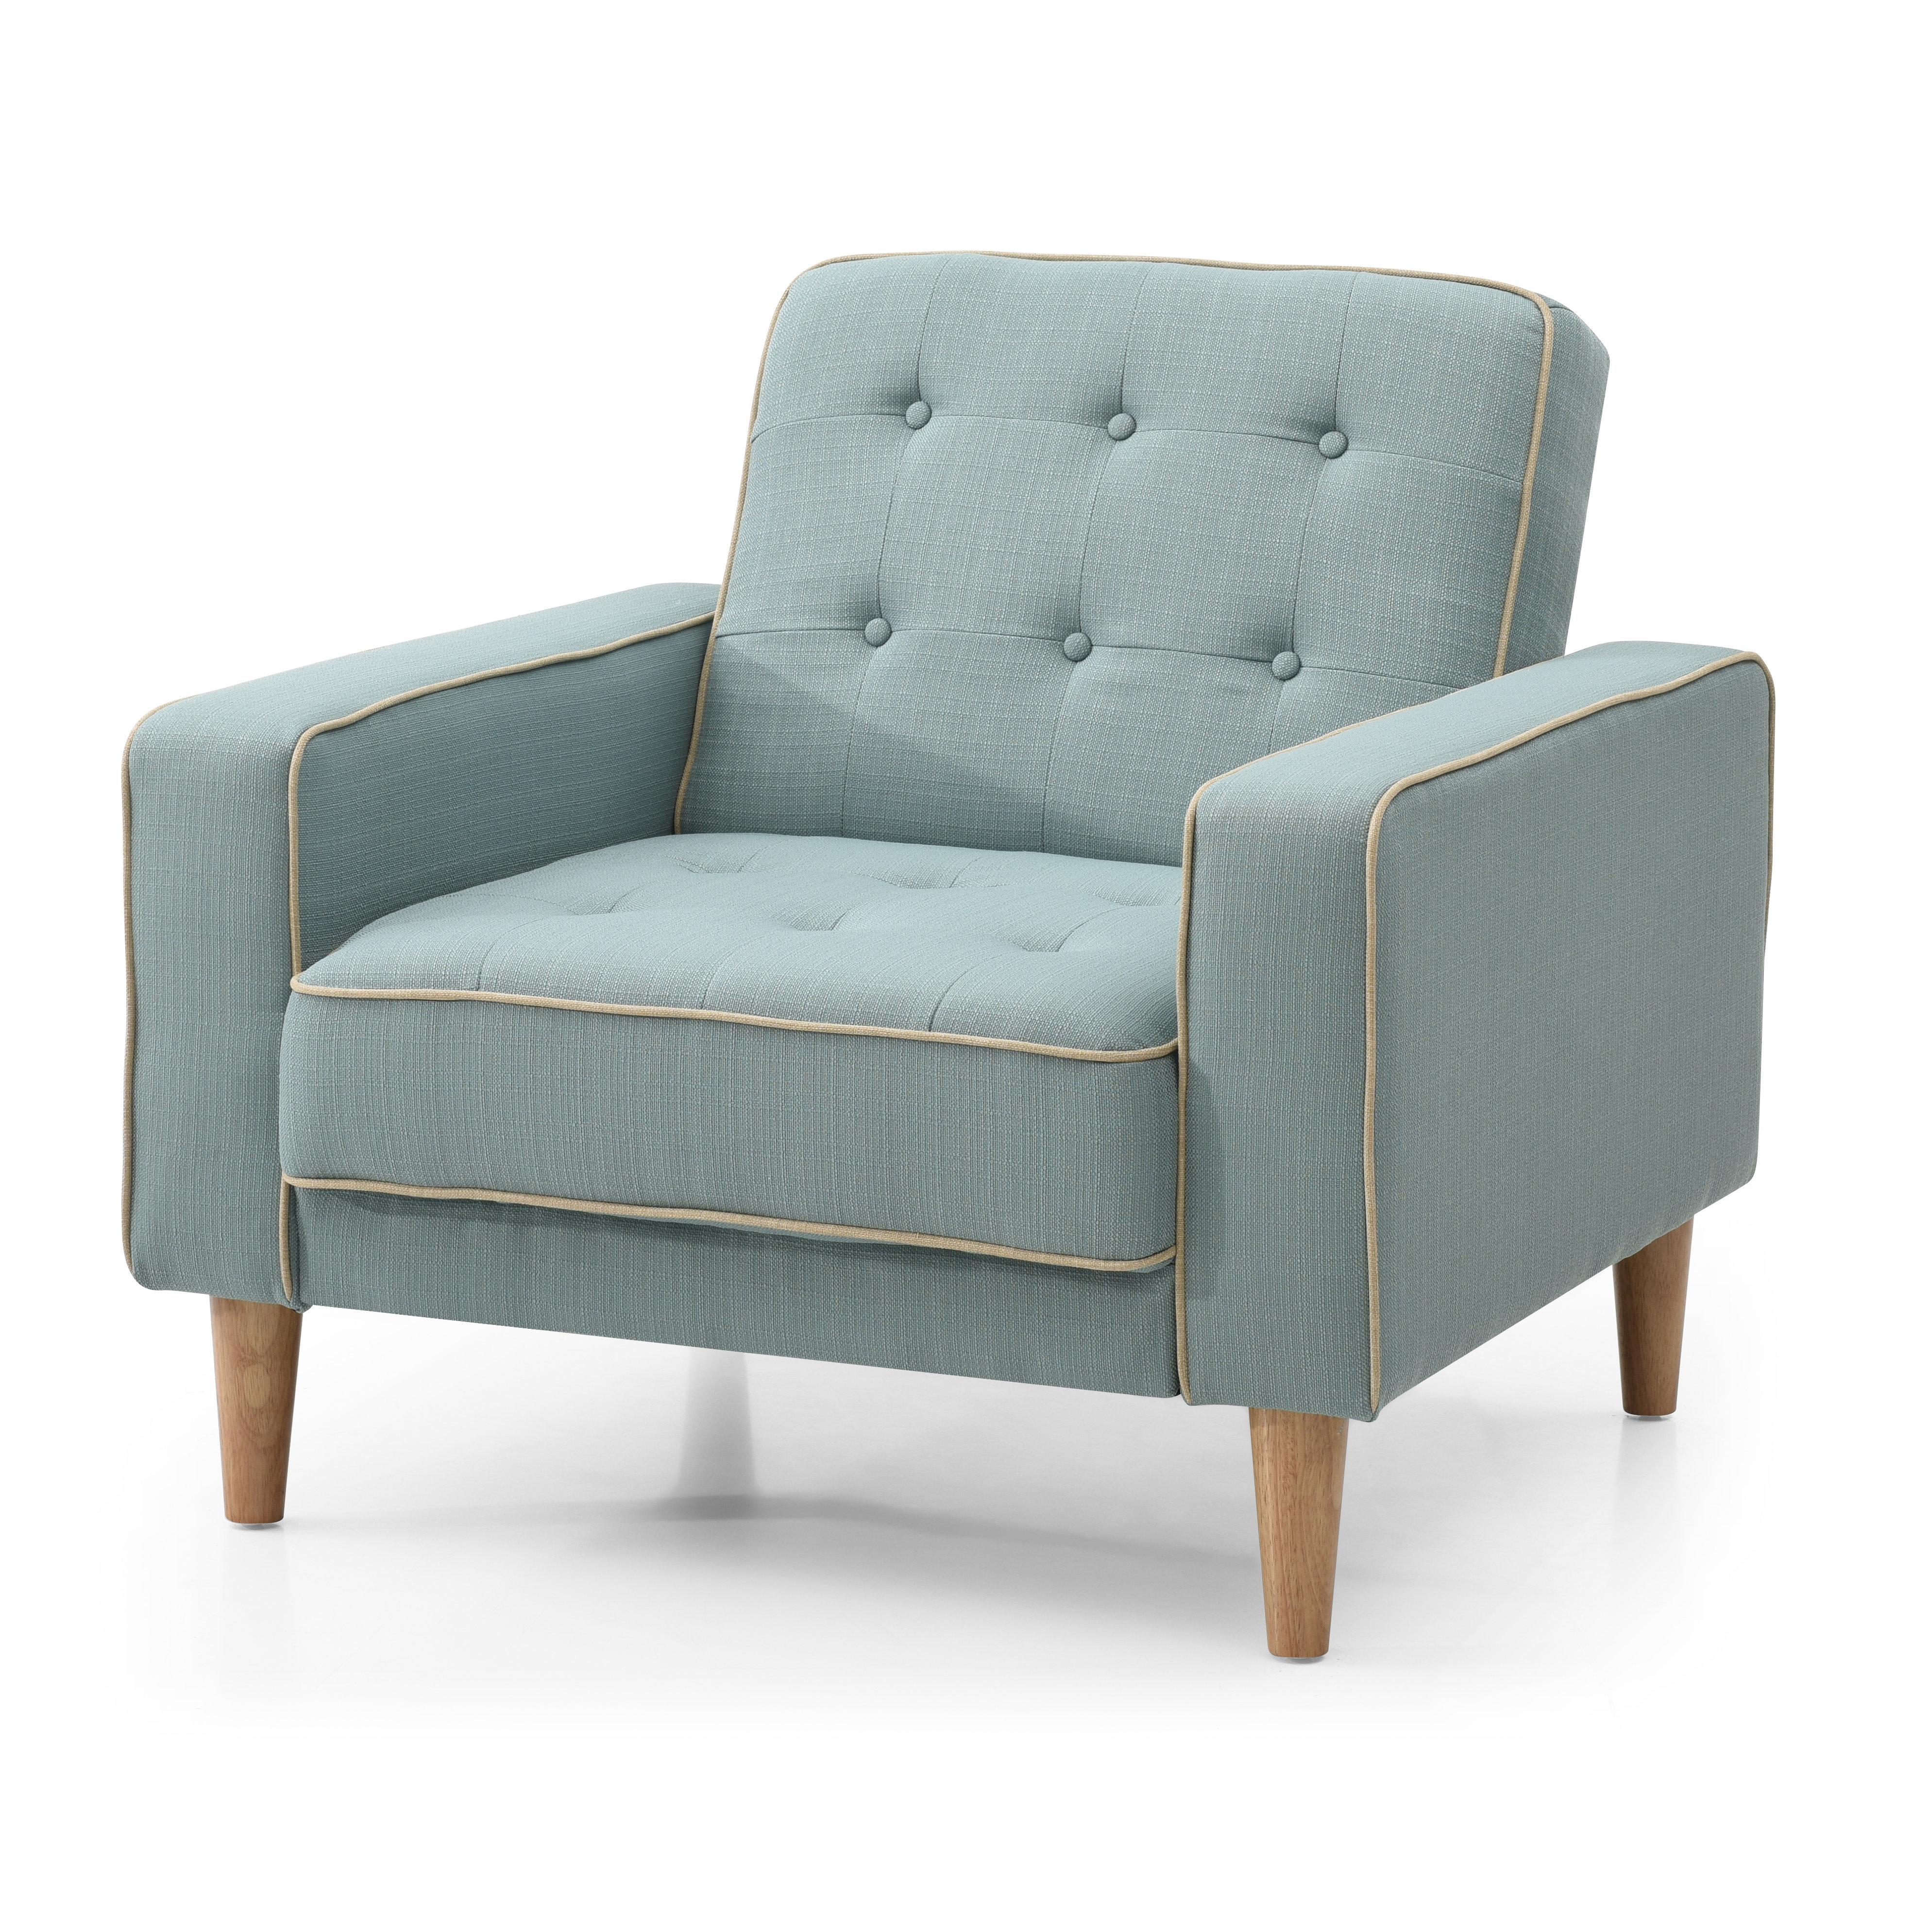 Ivy Bronx Shayne Convertible Chair & Reviews | Wayfair